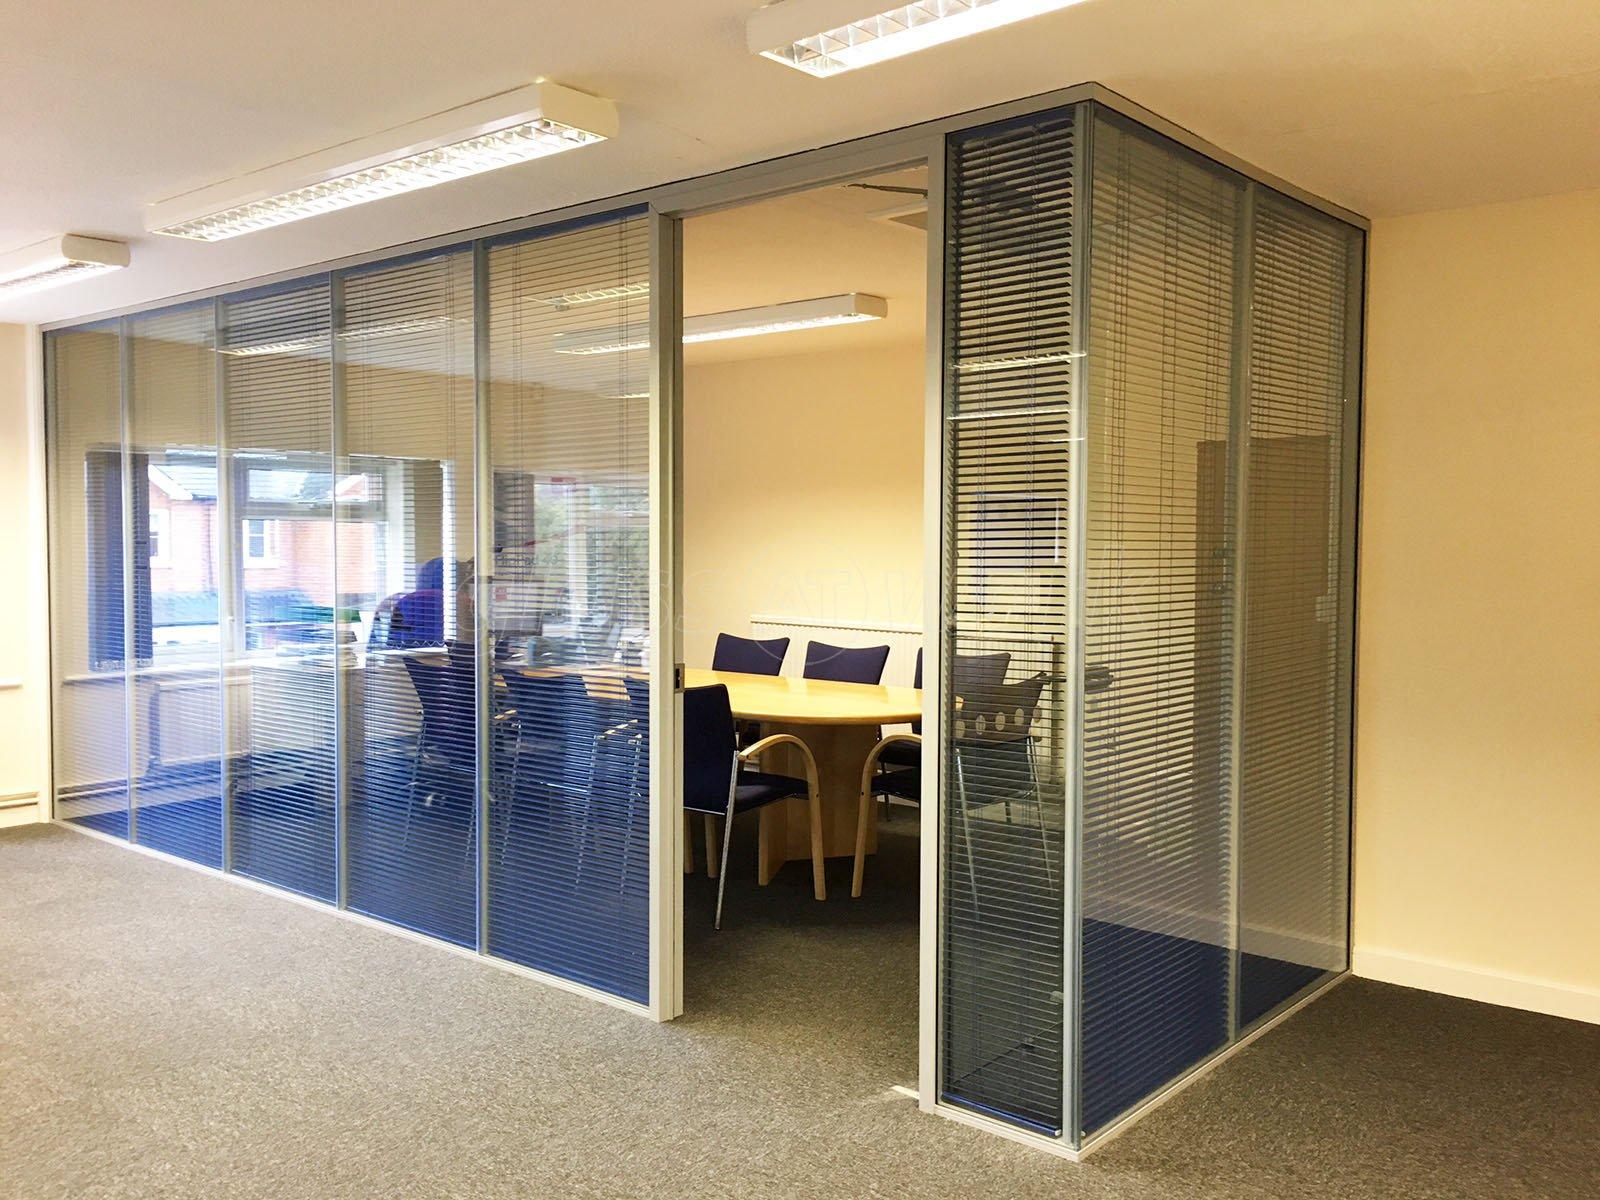 divisoria-micro-persiana-entre-vidros-piso-teto-sala-reuniao.jpg